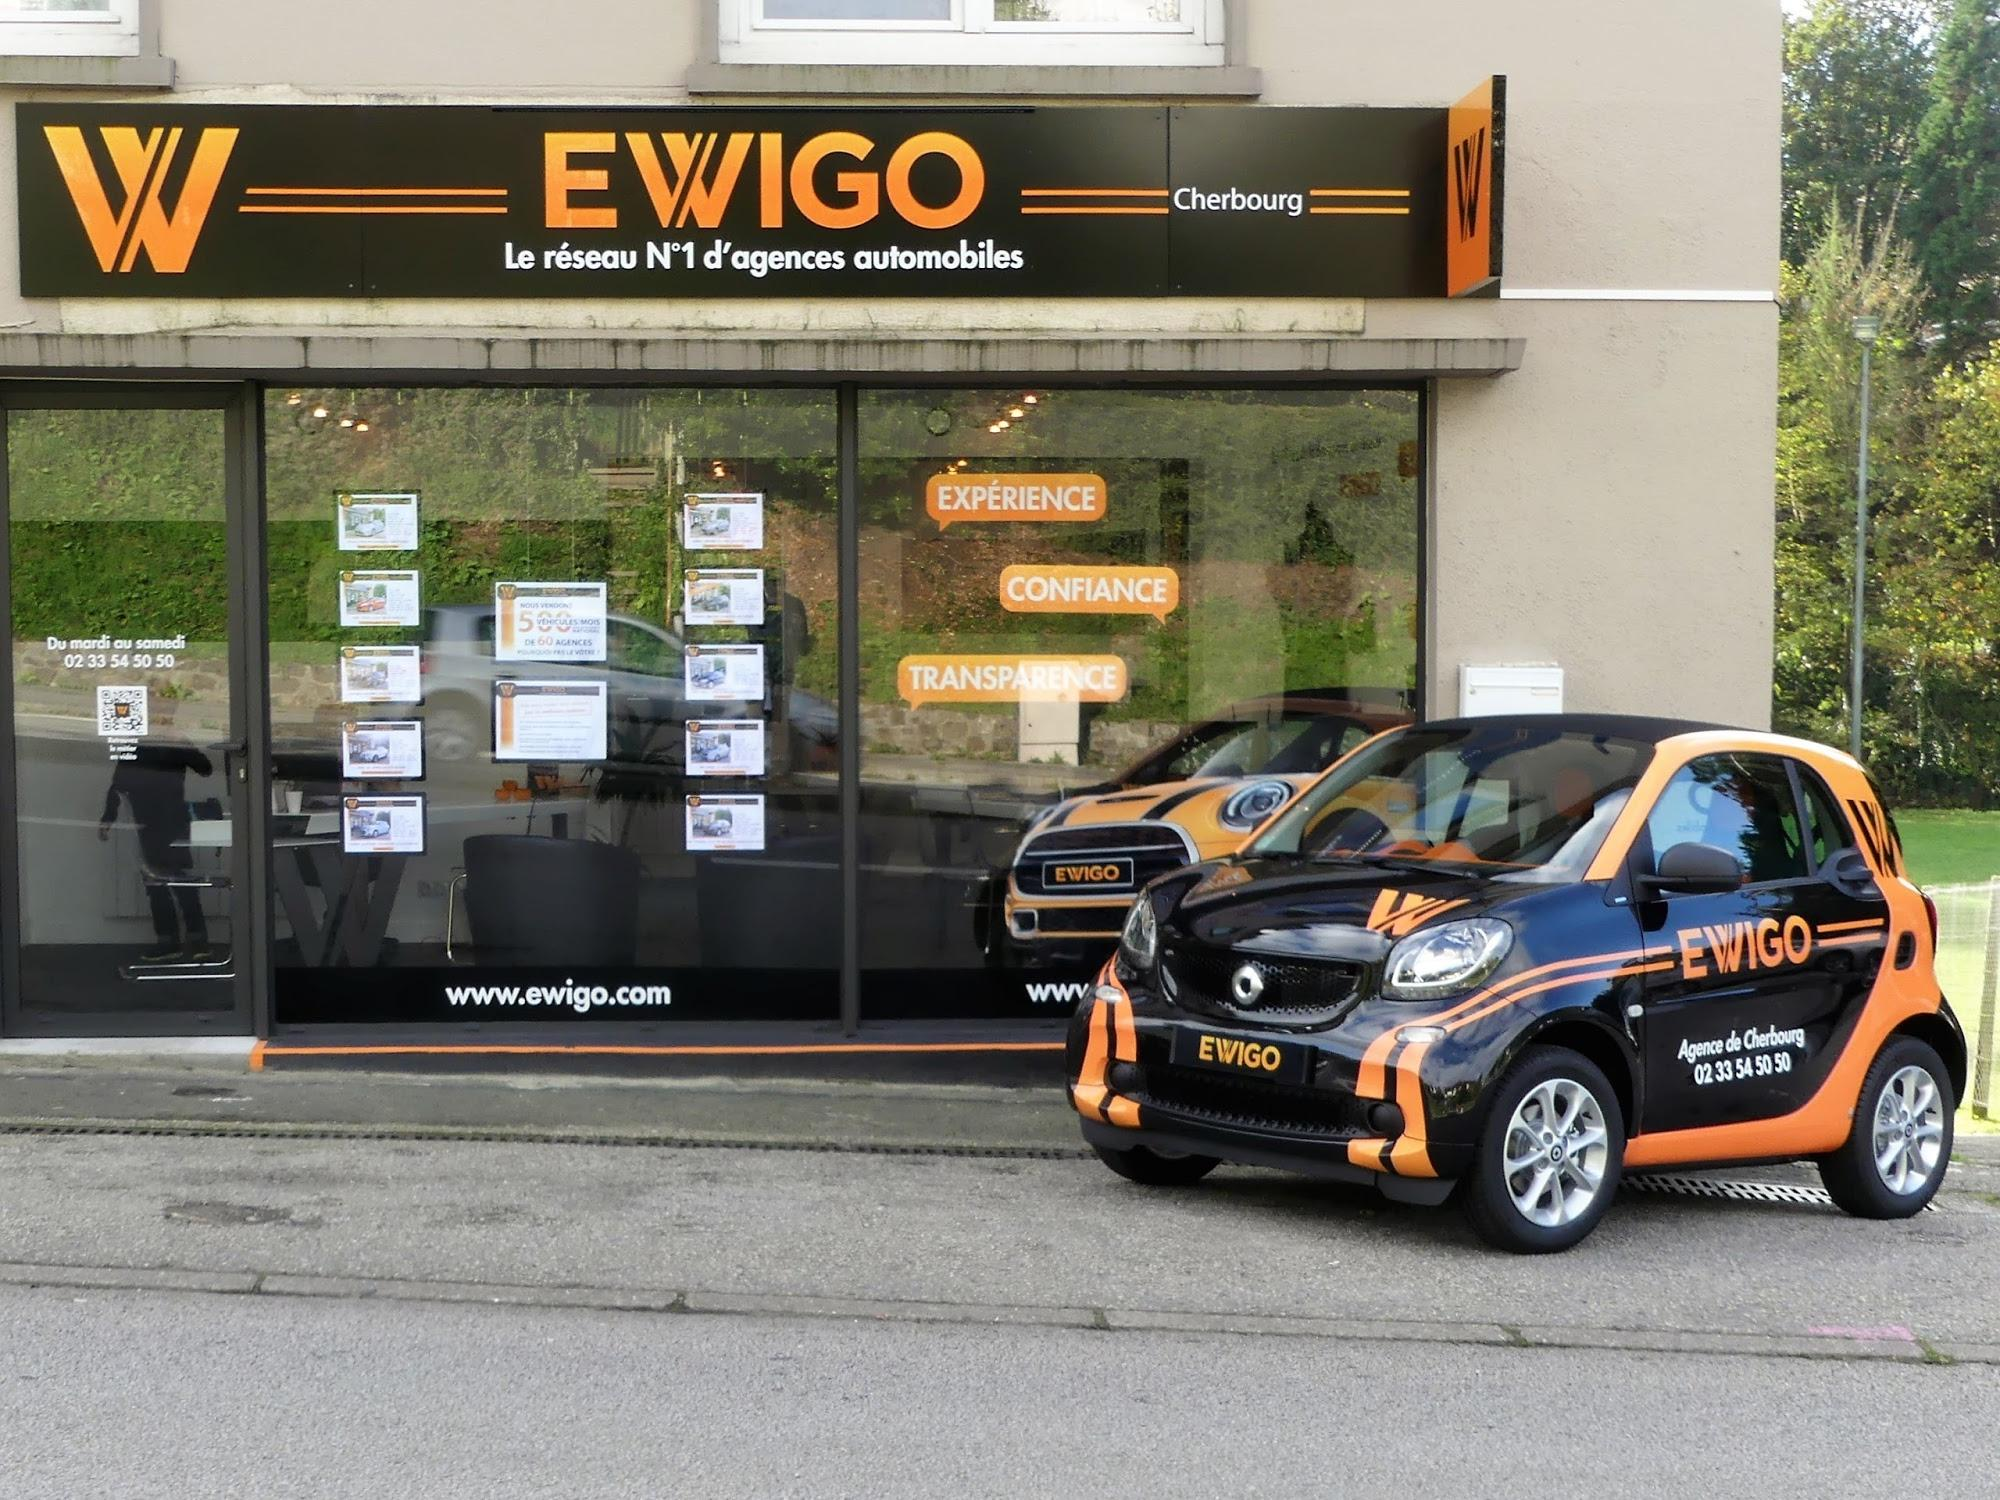 Ewigo Cherbourg CHERBOURG-EN-COTENTIN 7